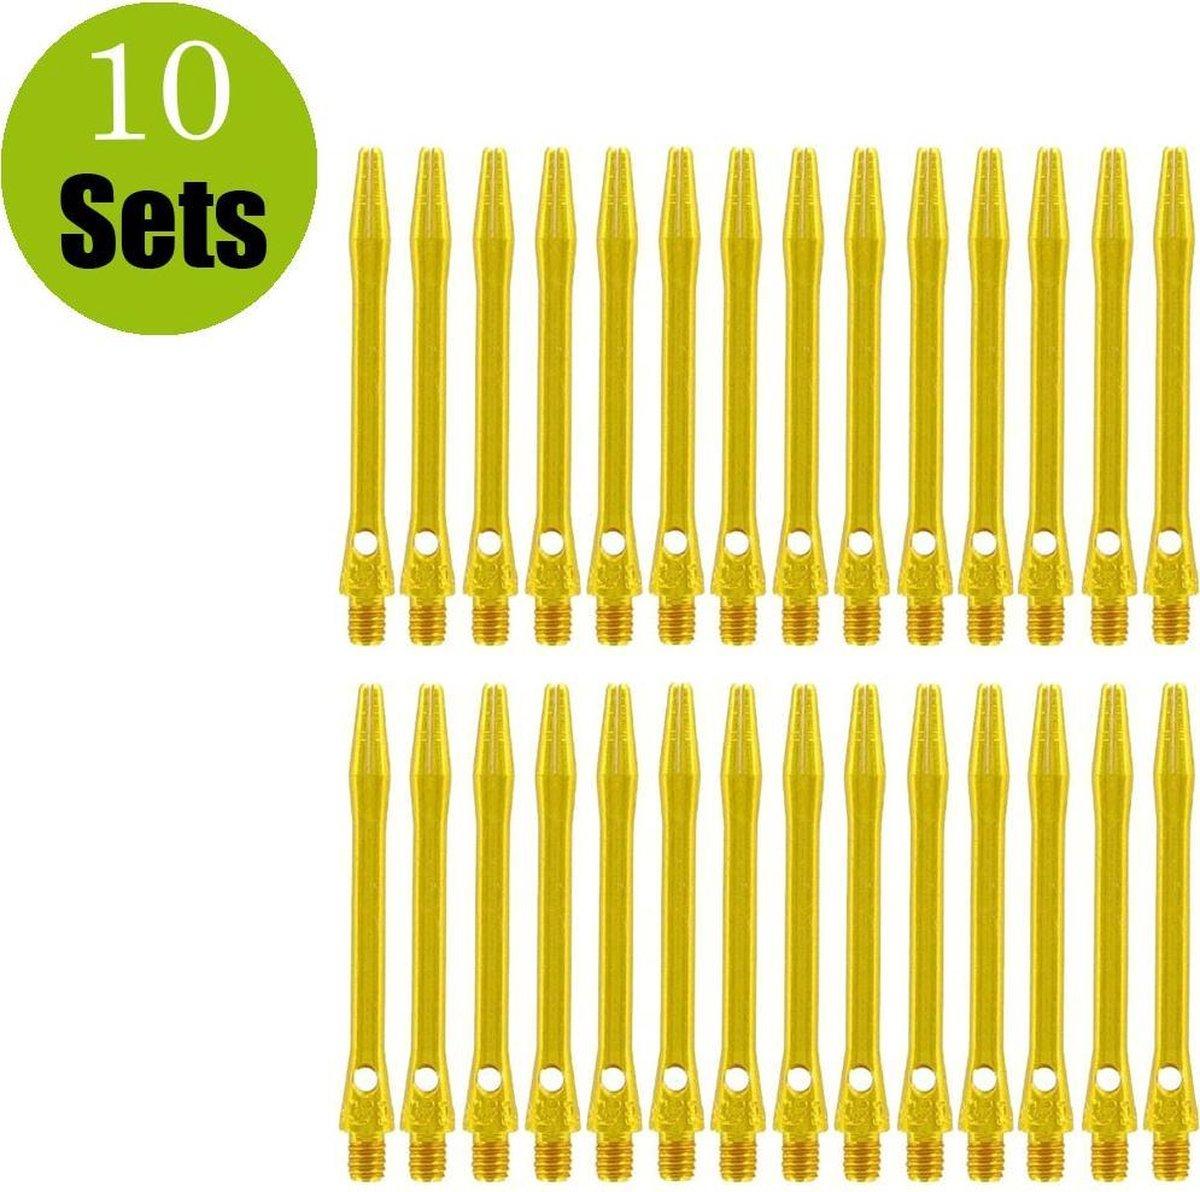 Aluminium Dart Shafts - Goud - Short - (10 Sets)